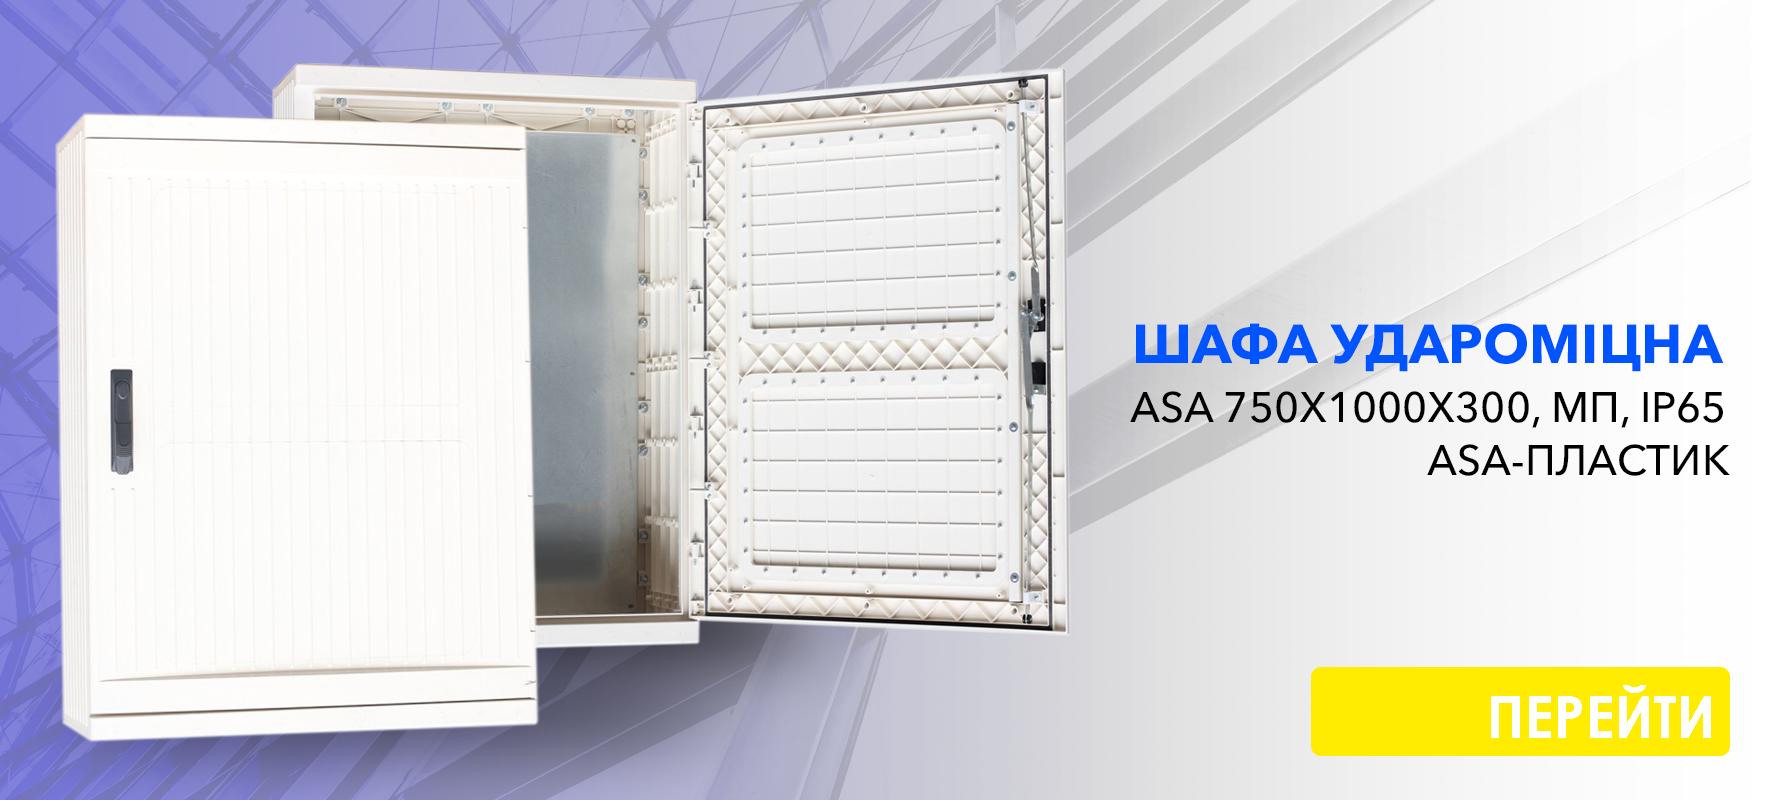 Шкаф ударопрочный ASA 750x1000x300